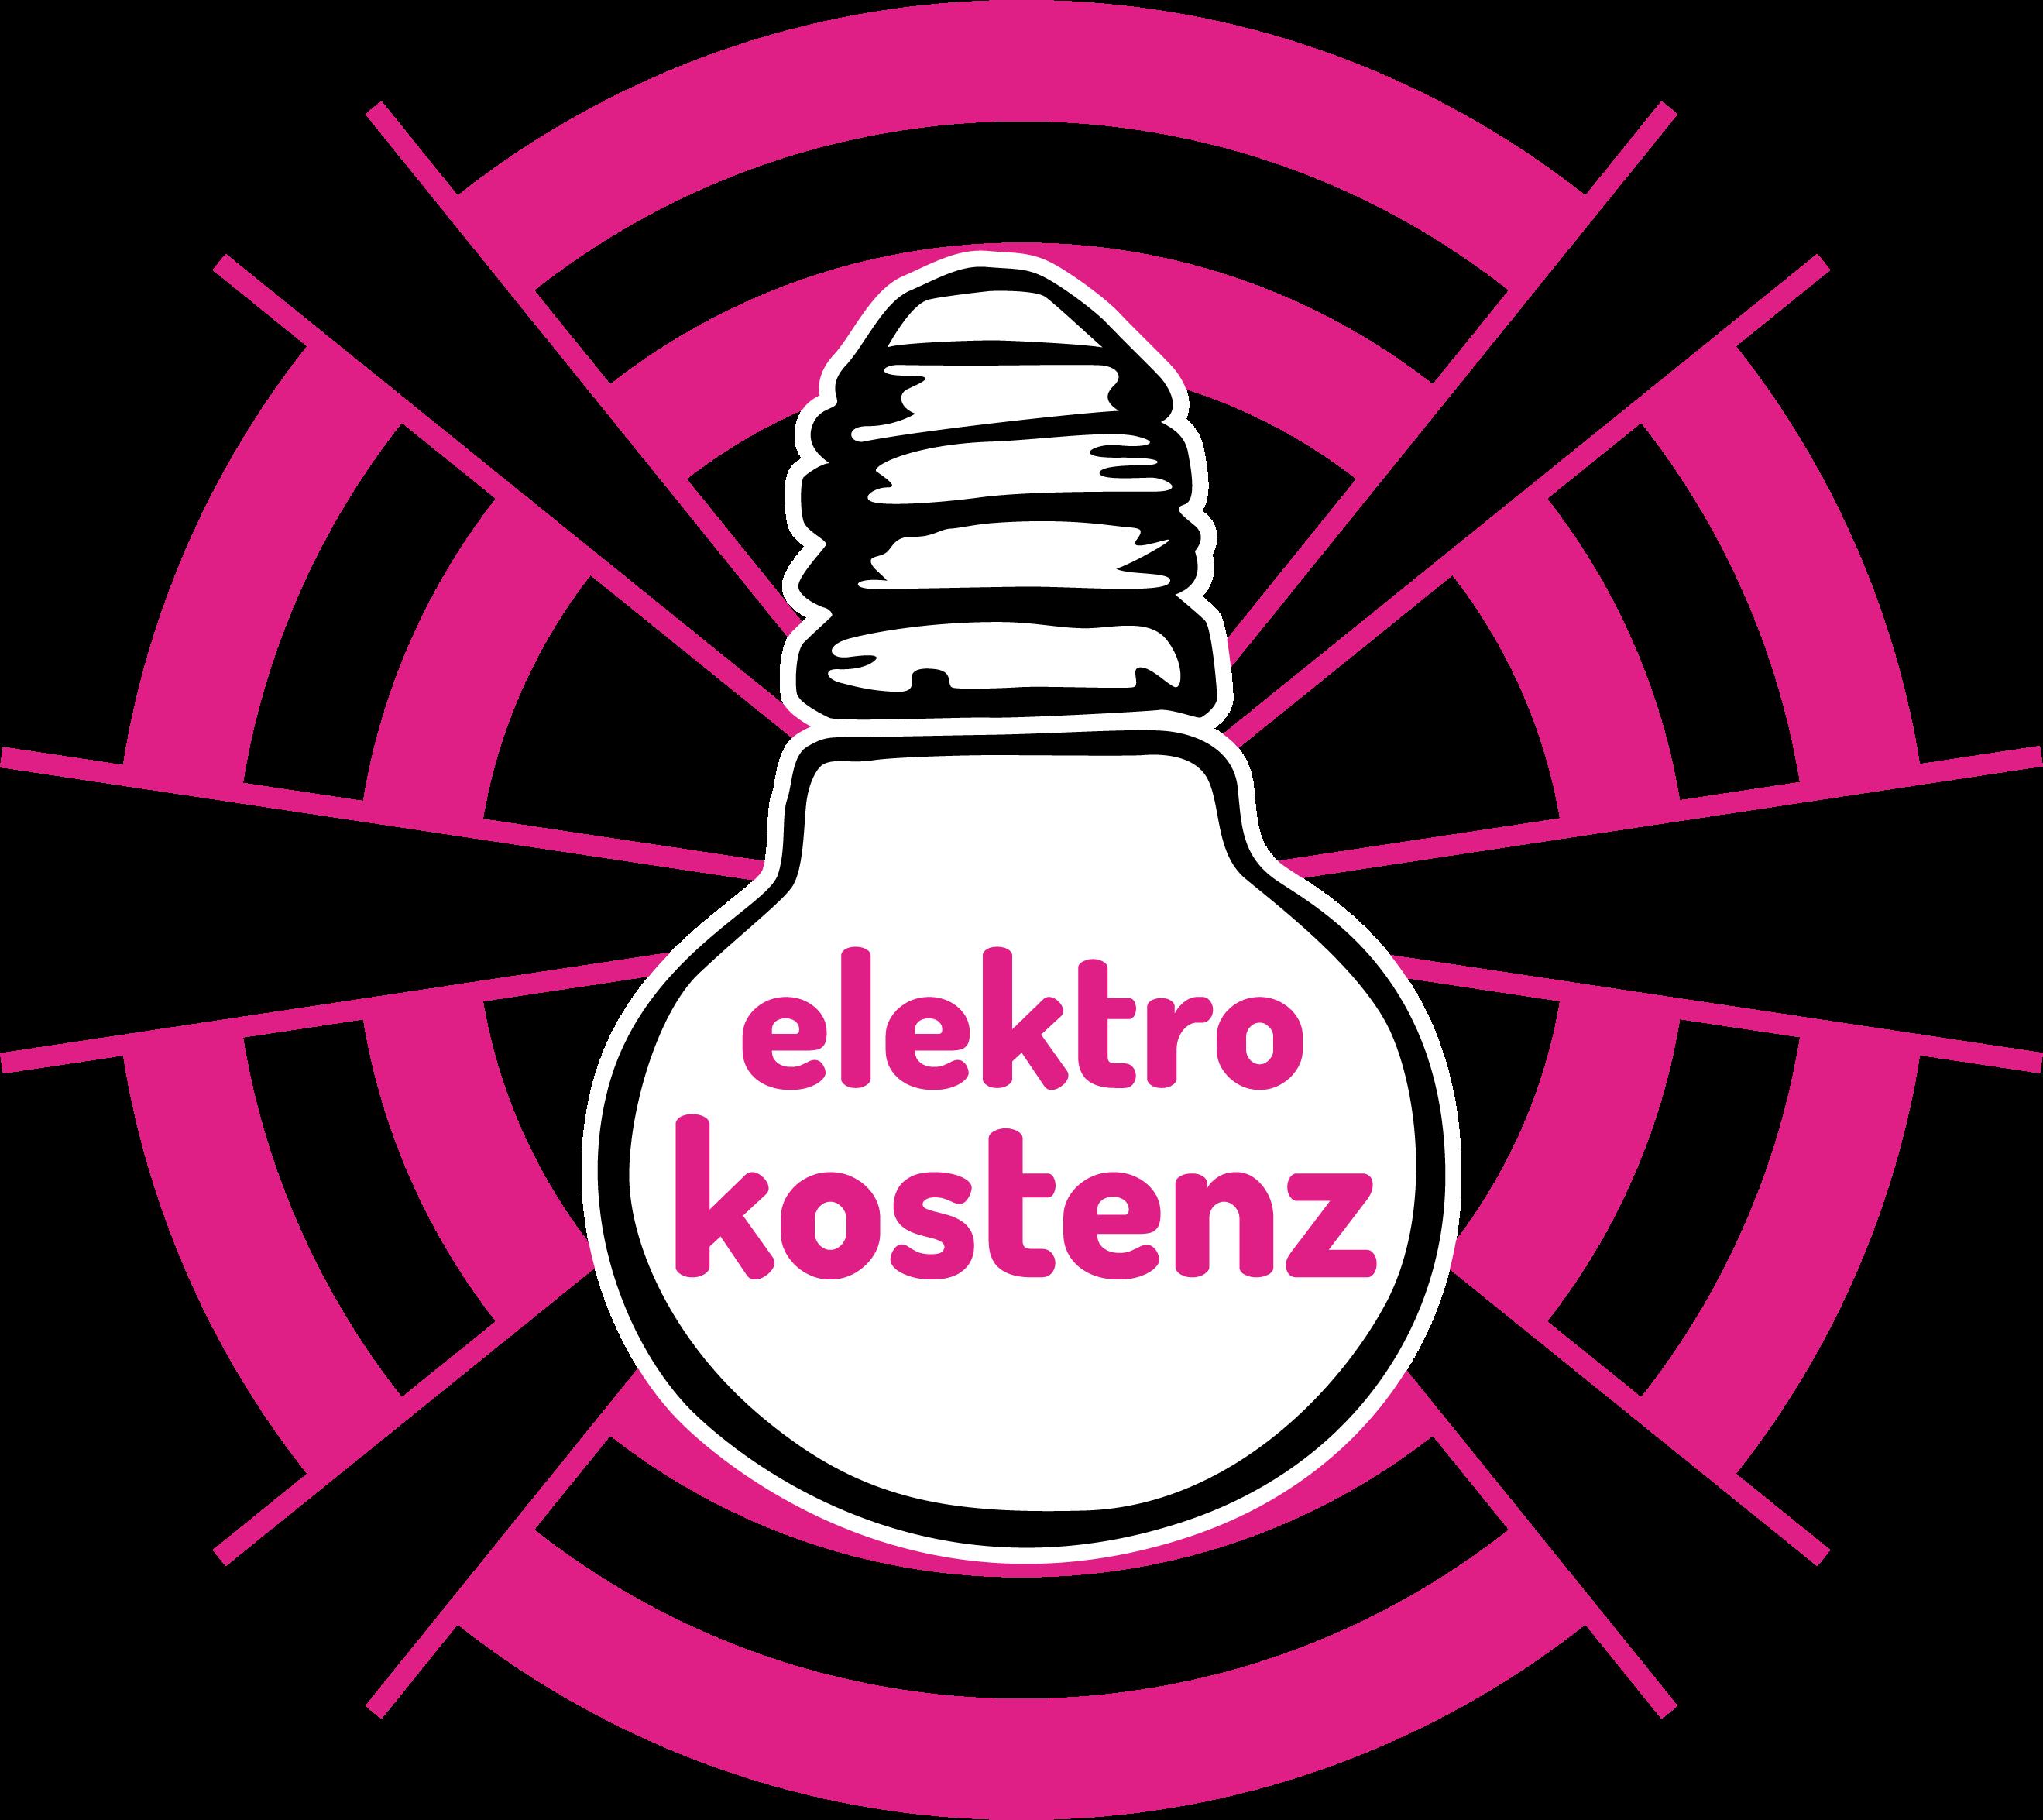 elektro kostenz